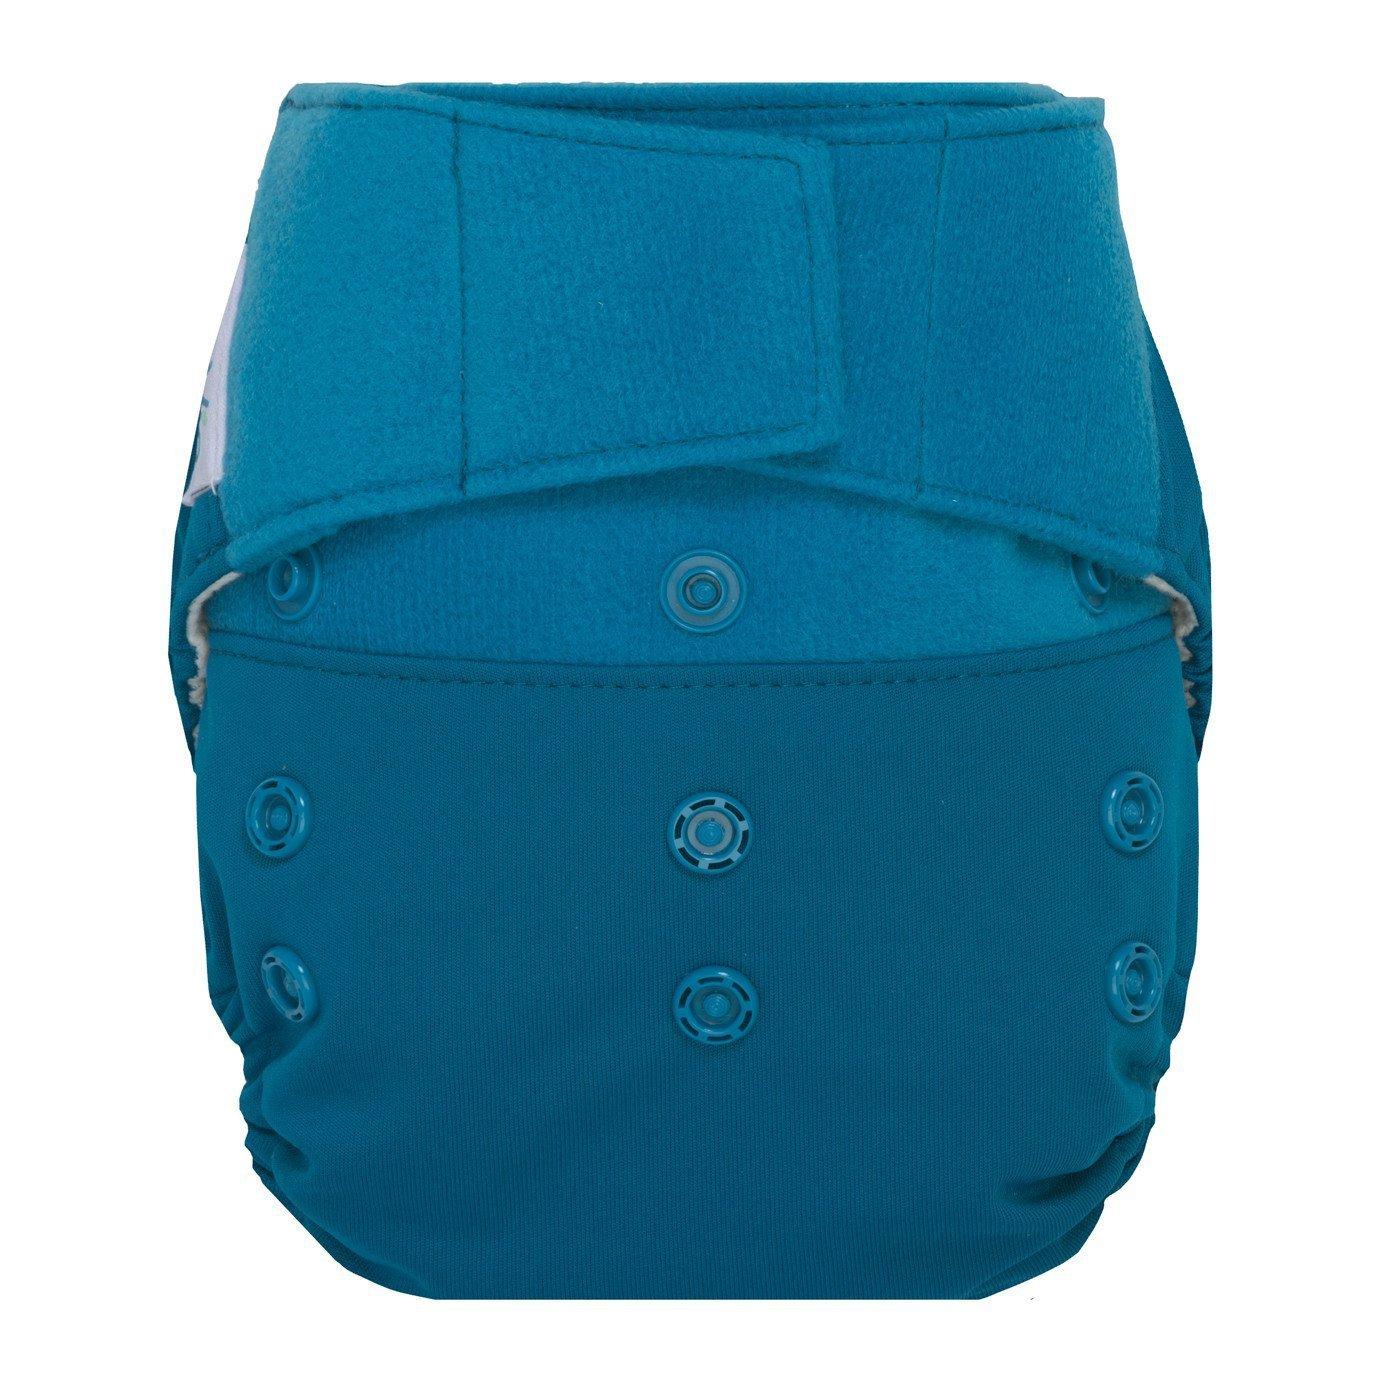 Amazon.com : GroVia Hybrid Cloth Diaper Shell, Hook & Loop Shell (Abalone) : Baby